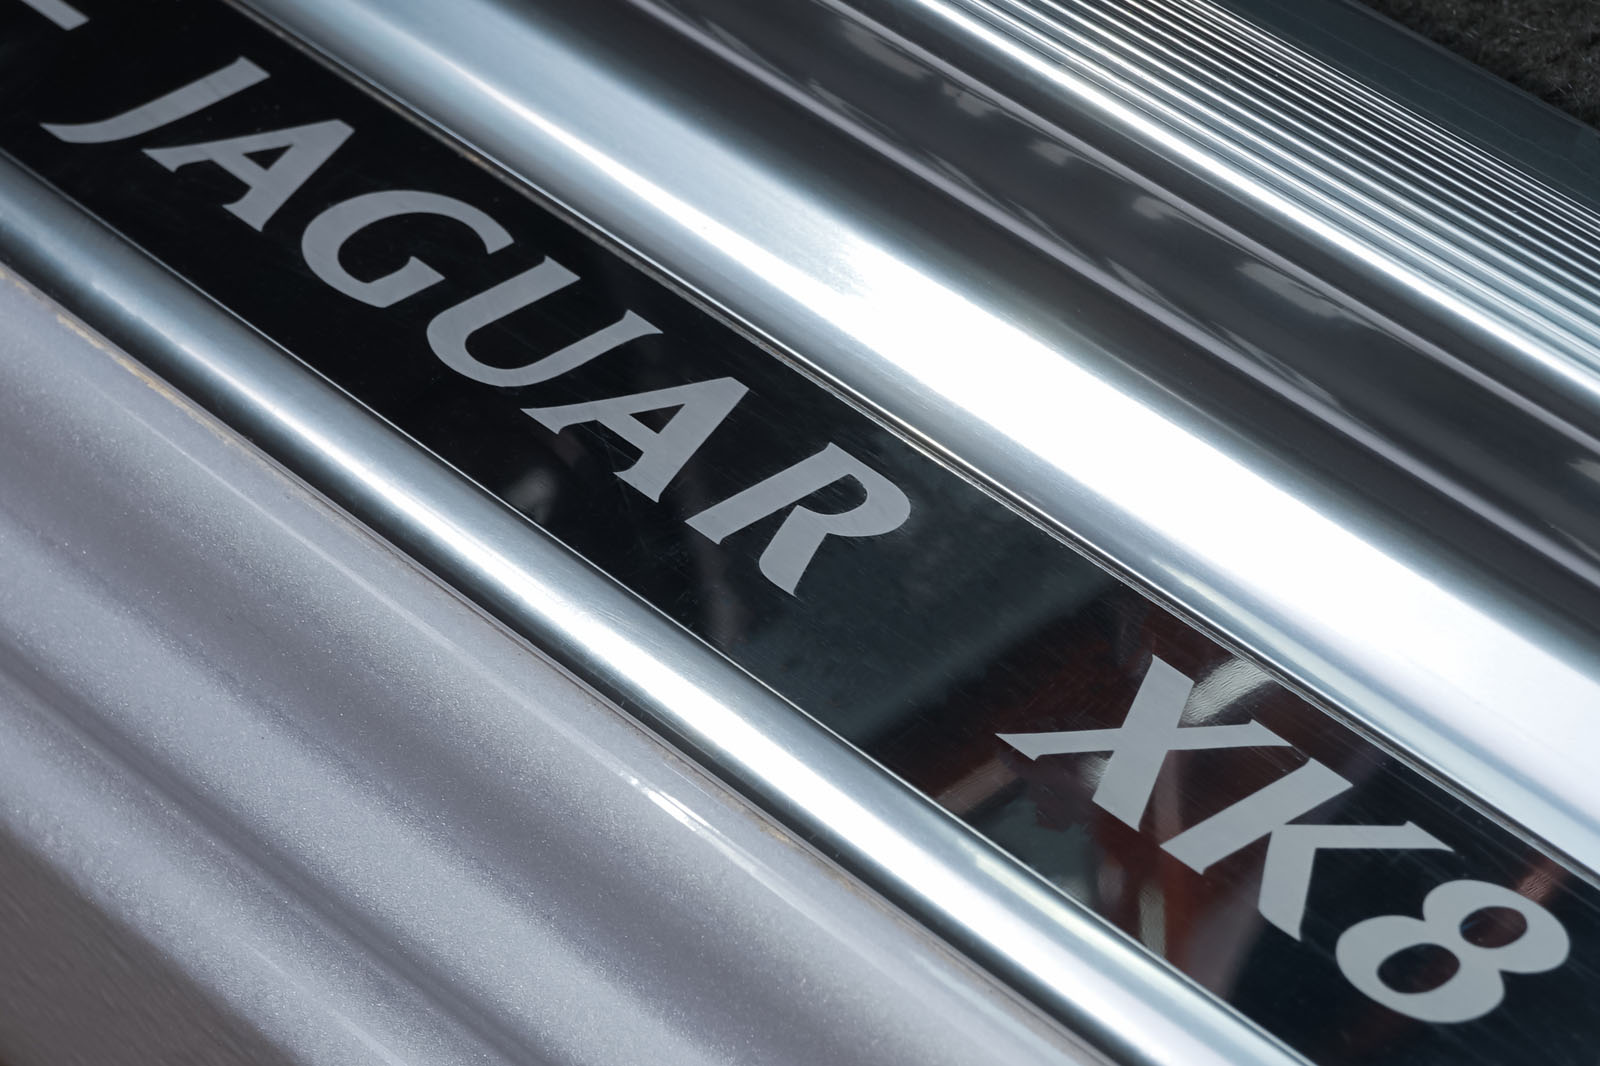 Jaguar_XK8_4.0_Silber_Schwarz_JAG-9731_10_w